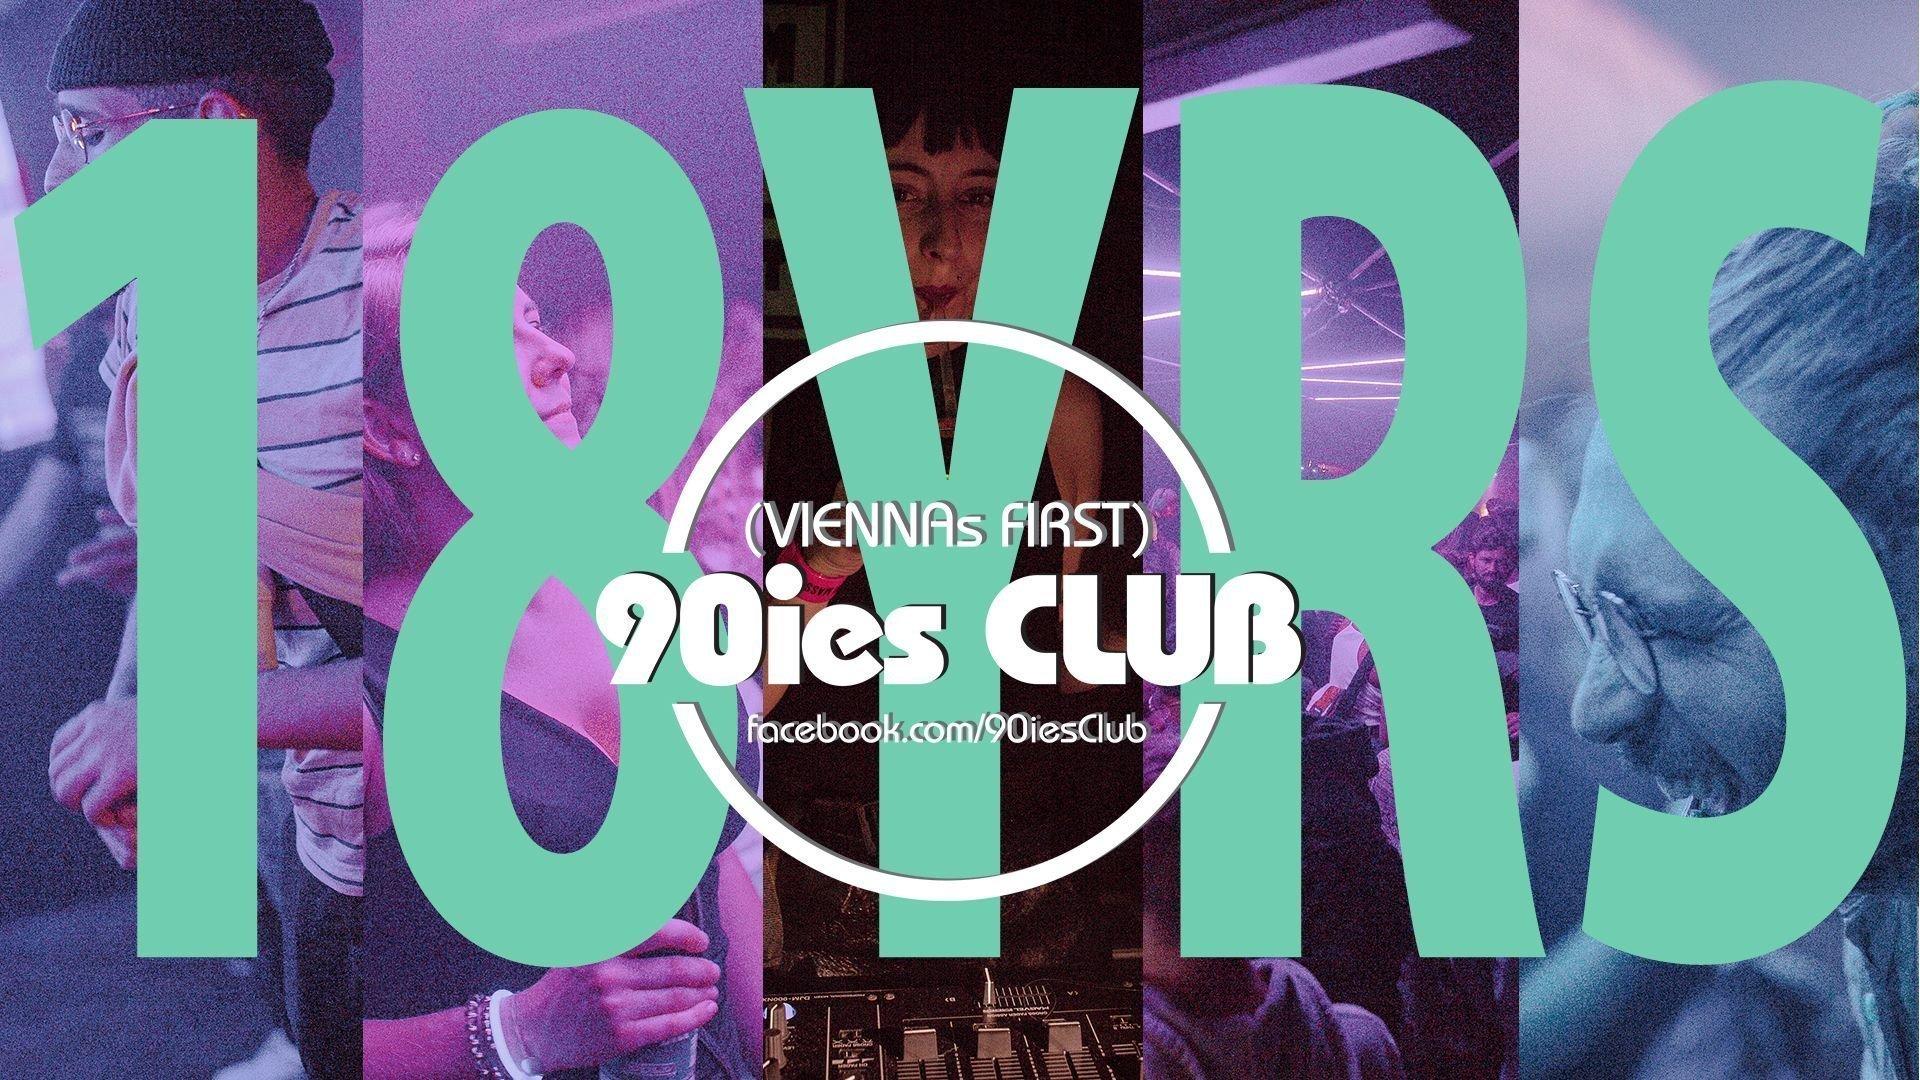 18 years of 90ies club